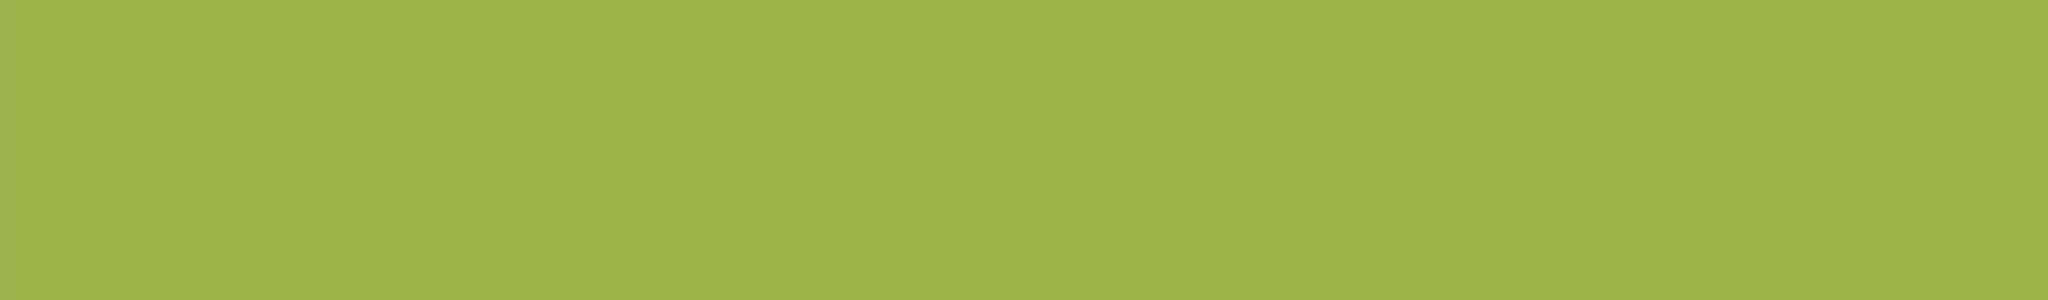 HU 16526 ABS Edge Green Smooth Gloss 90°